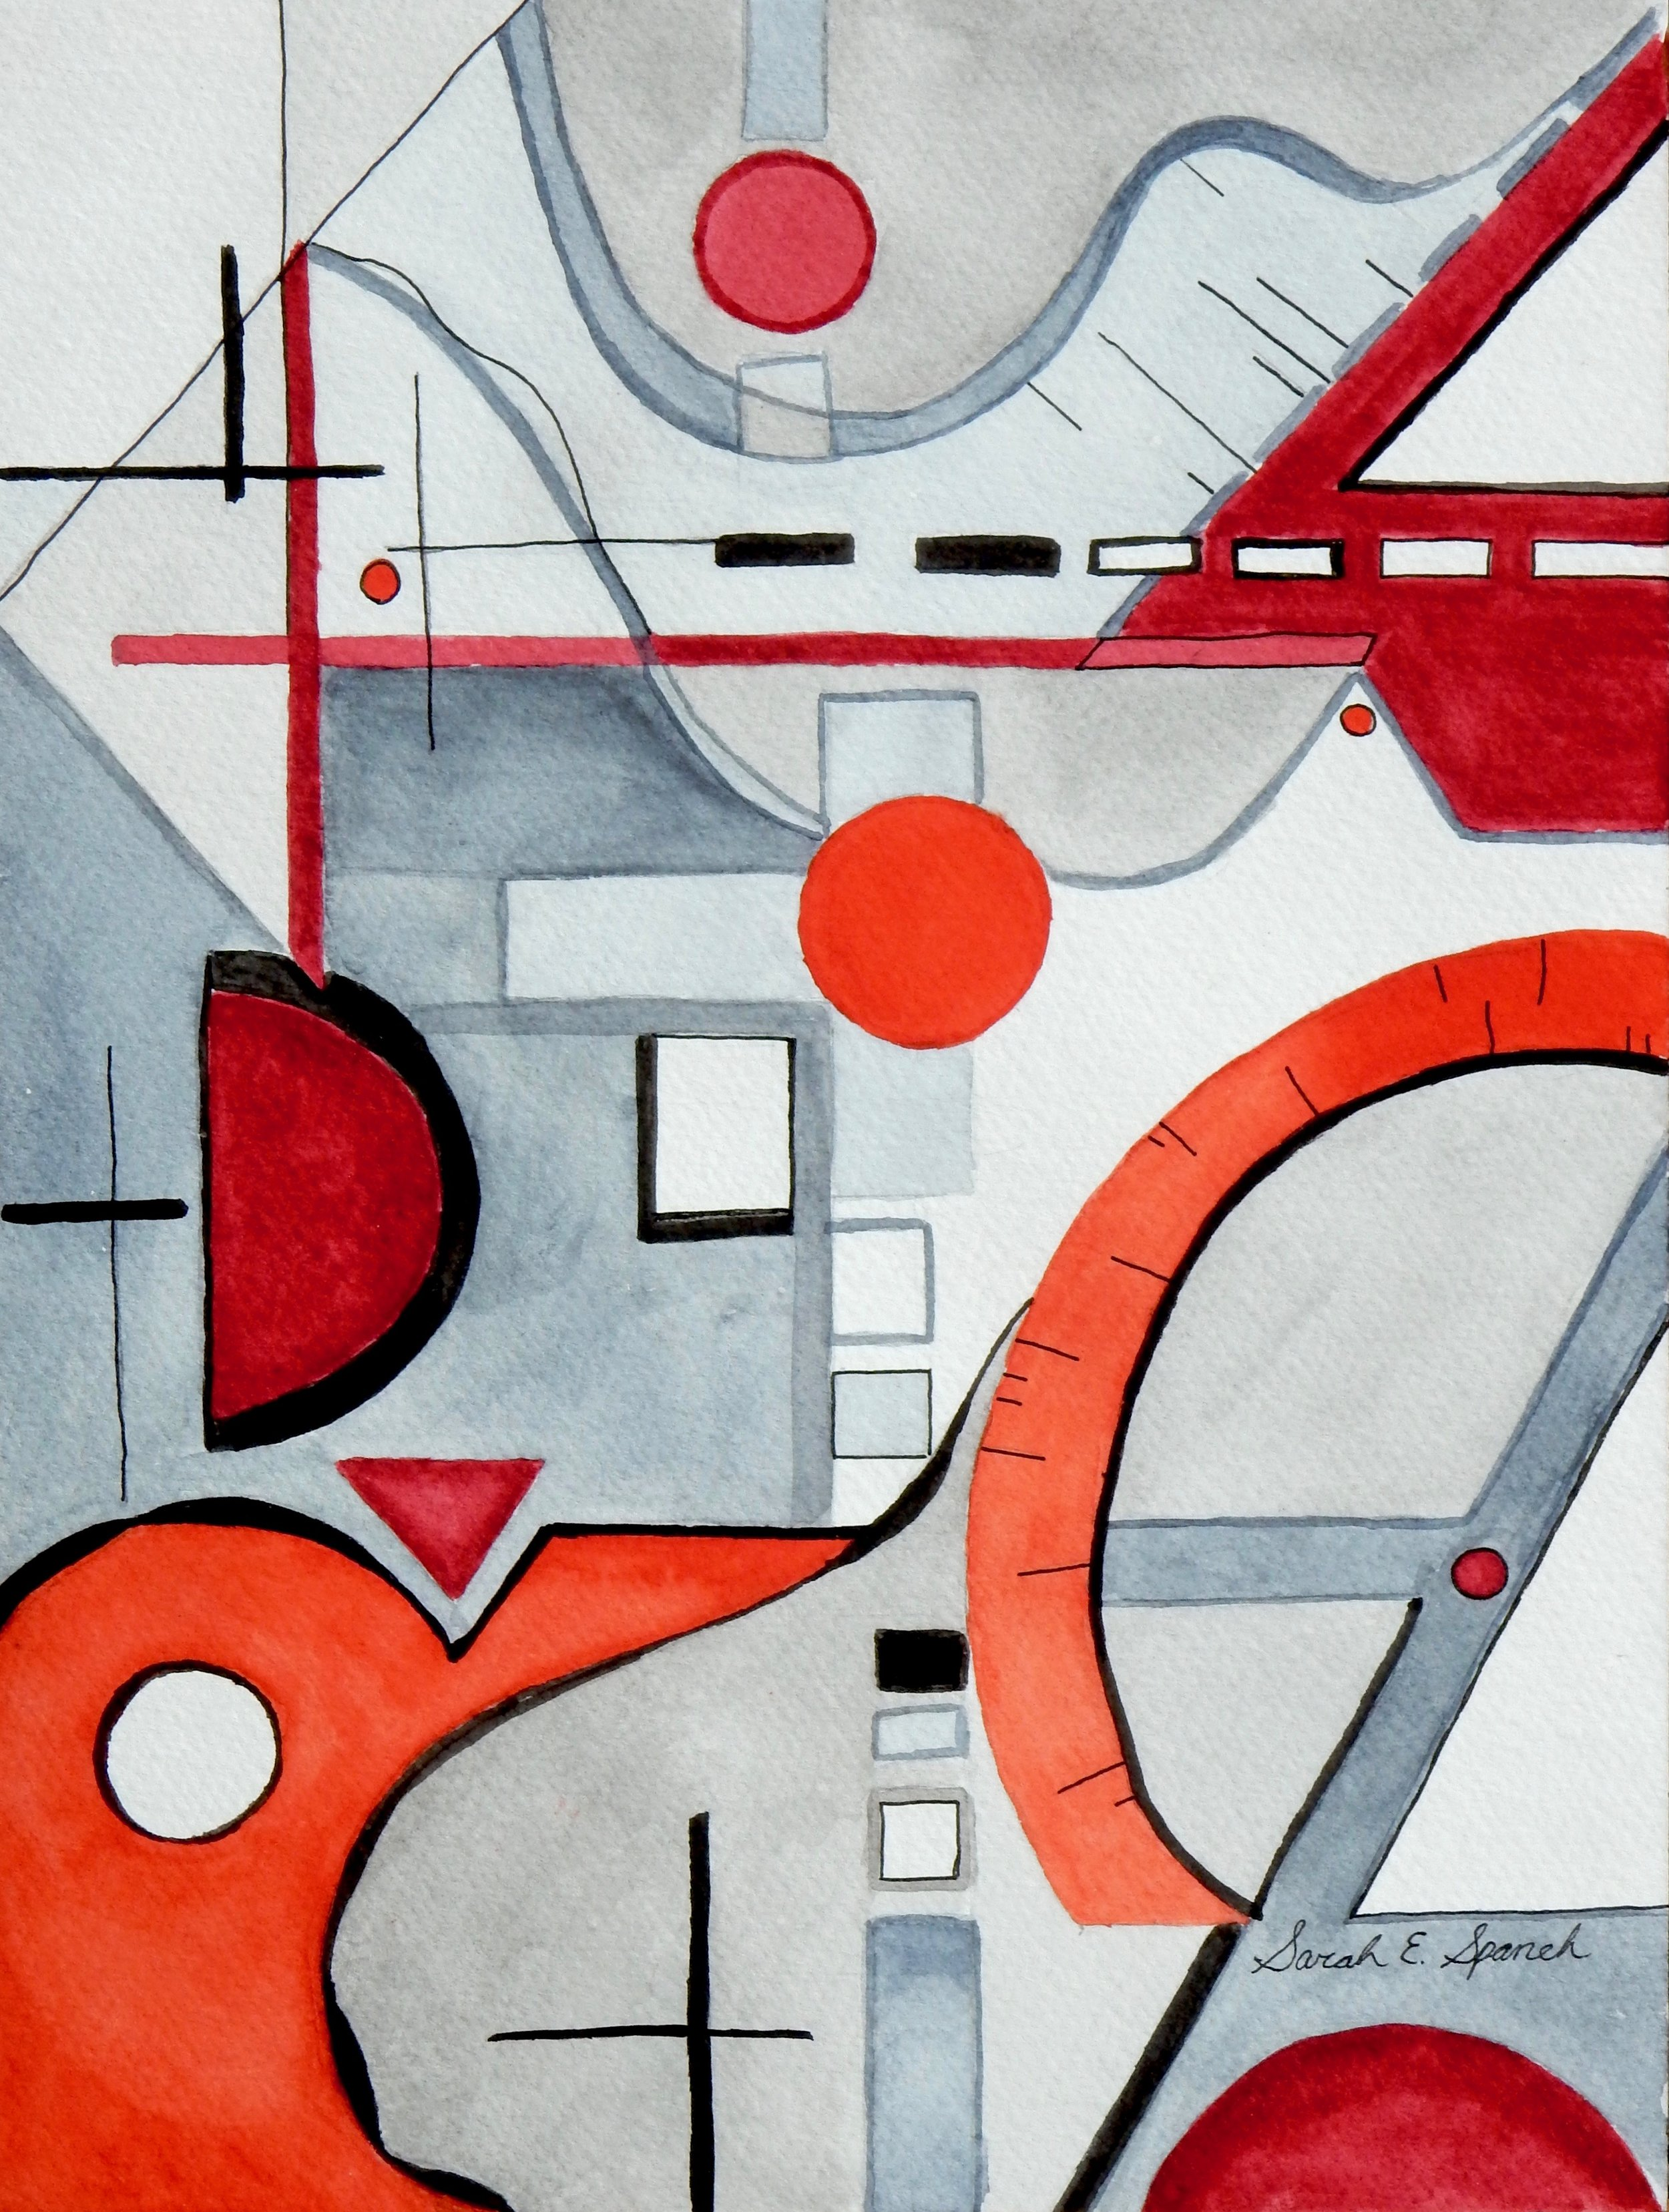 Sarah Spanek. Mathematica Misceo. watercolor